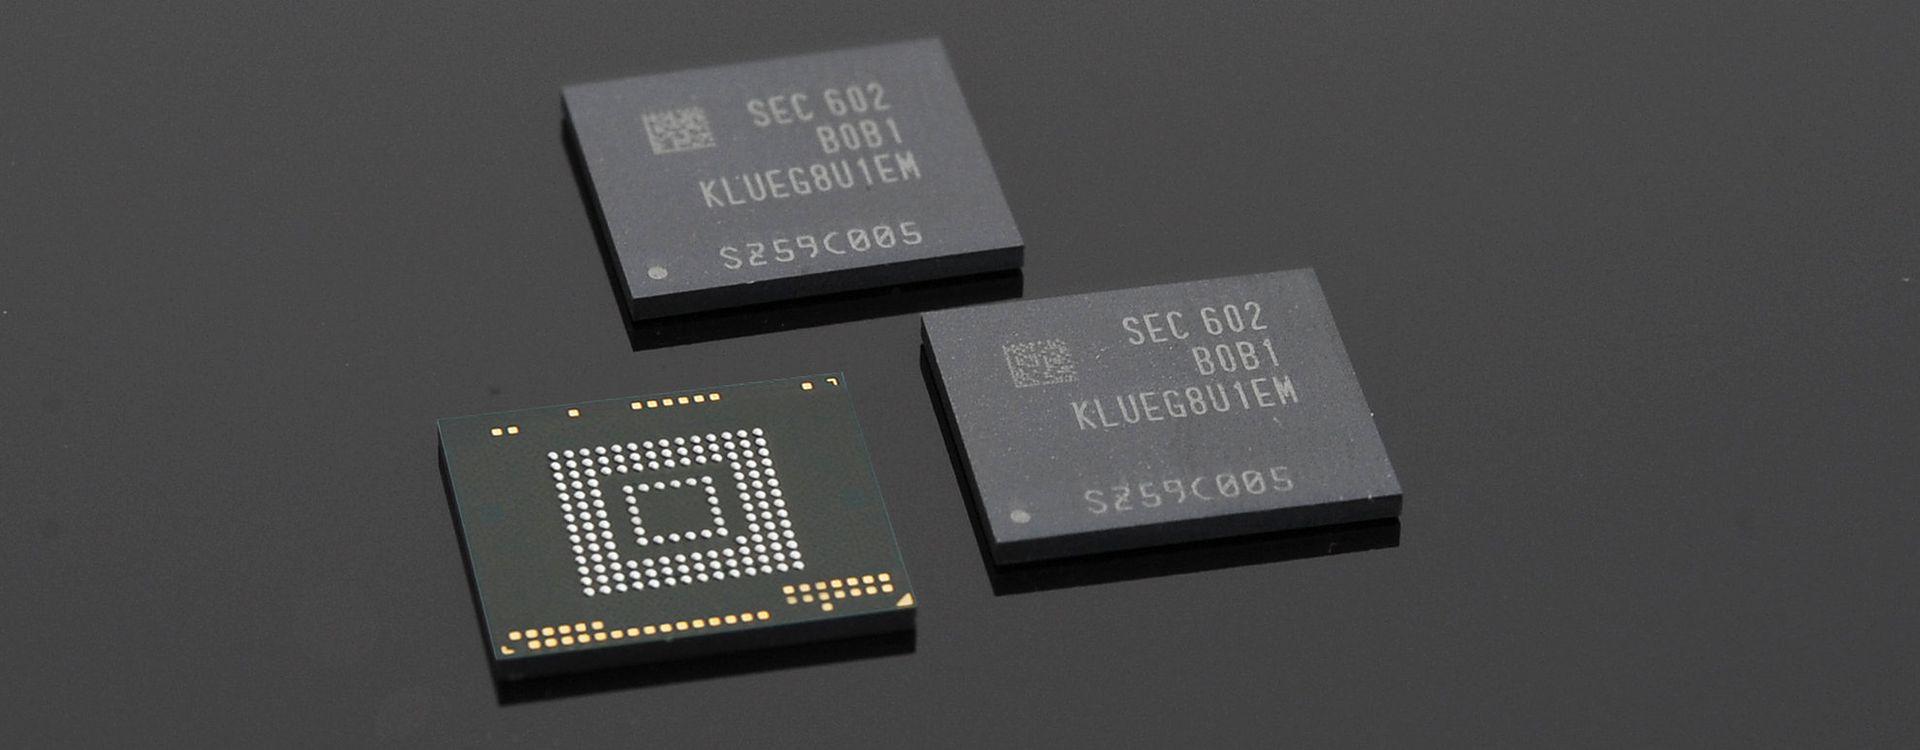 Kości pamięci UFS 2.0 Samsunga